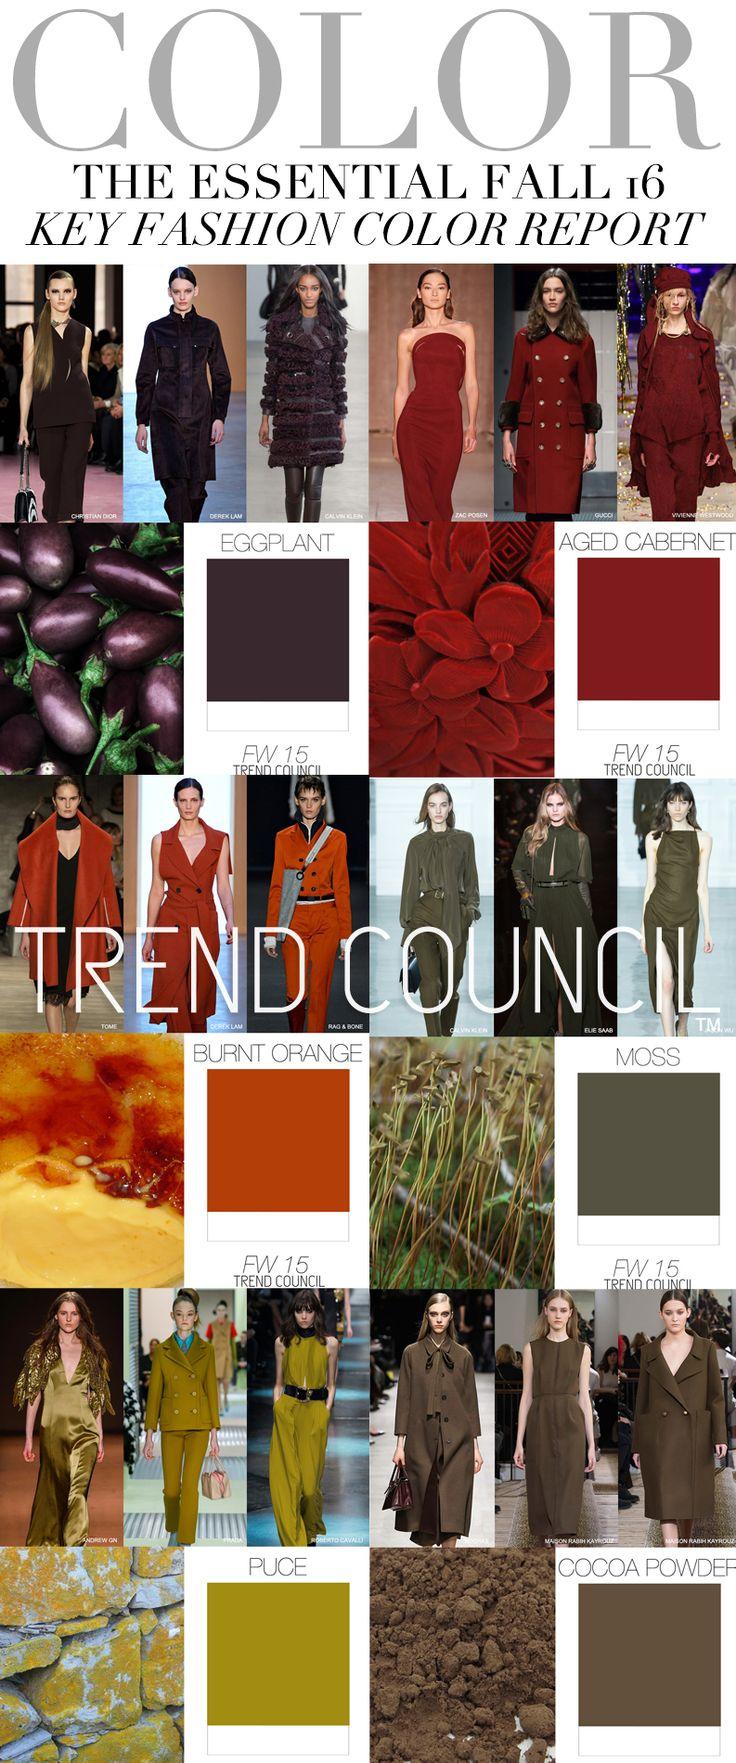 trend council f w 2016 key fashion color report fall winter 2016 color pinterest trends. Black Bedroom Furniture Sets. Home Design Ideas